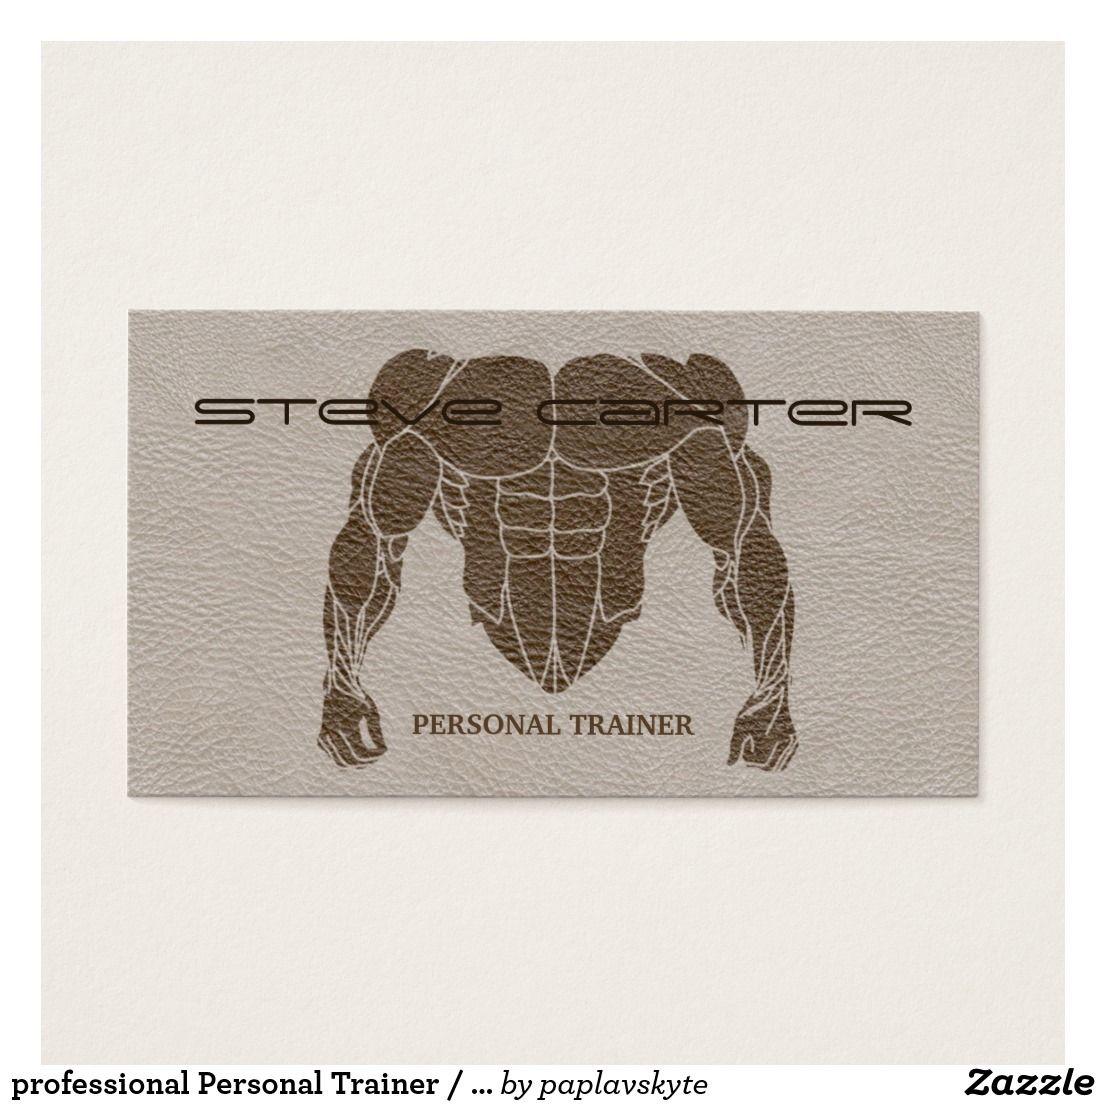 professional Personal Trainer / Bodybuilder Card Zazzle